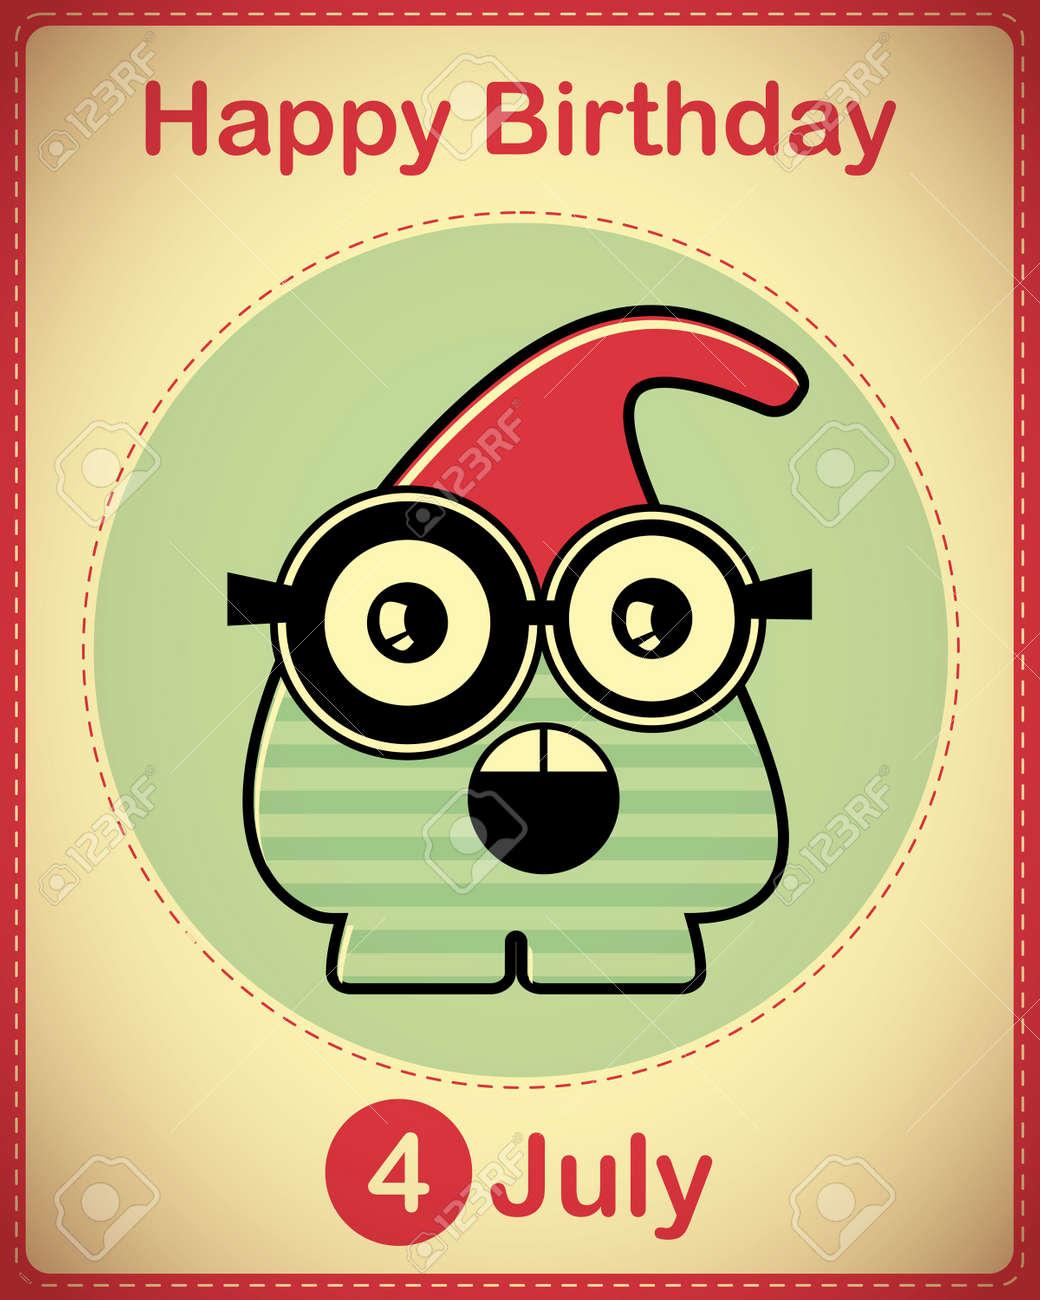 Happy birthday card with cute cartoon monster Stock Vector - 17978441